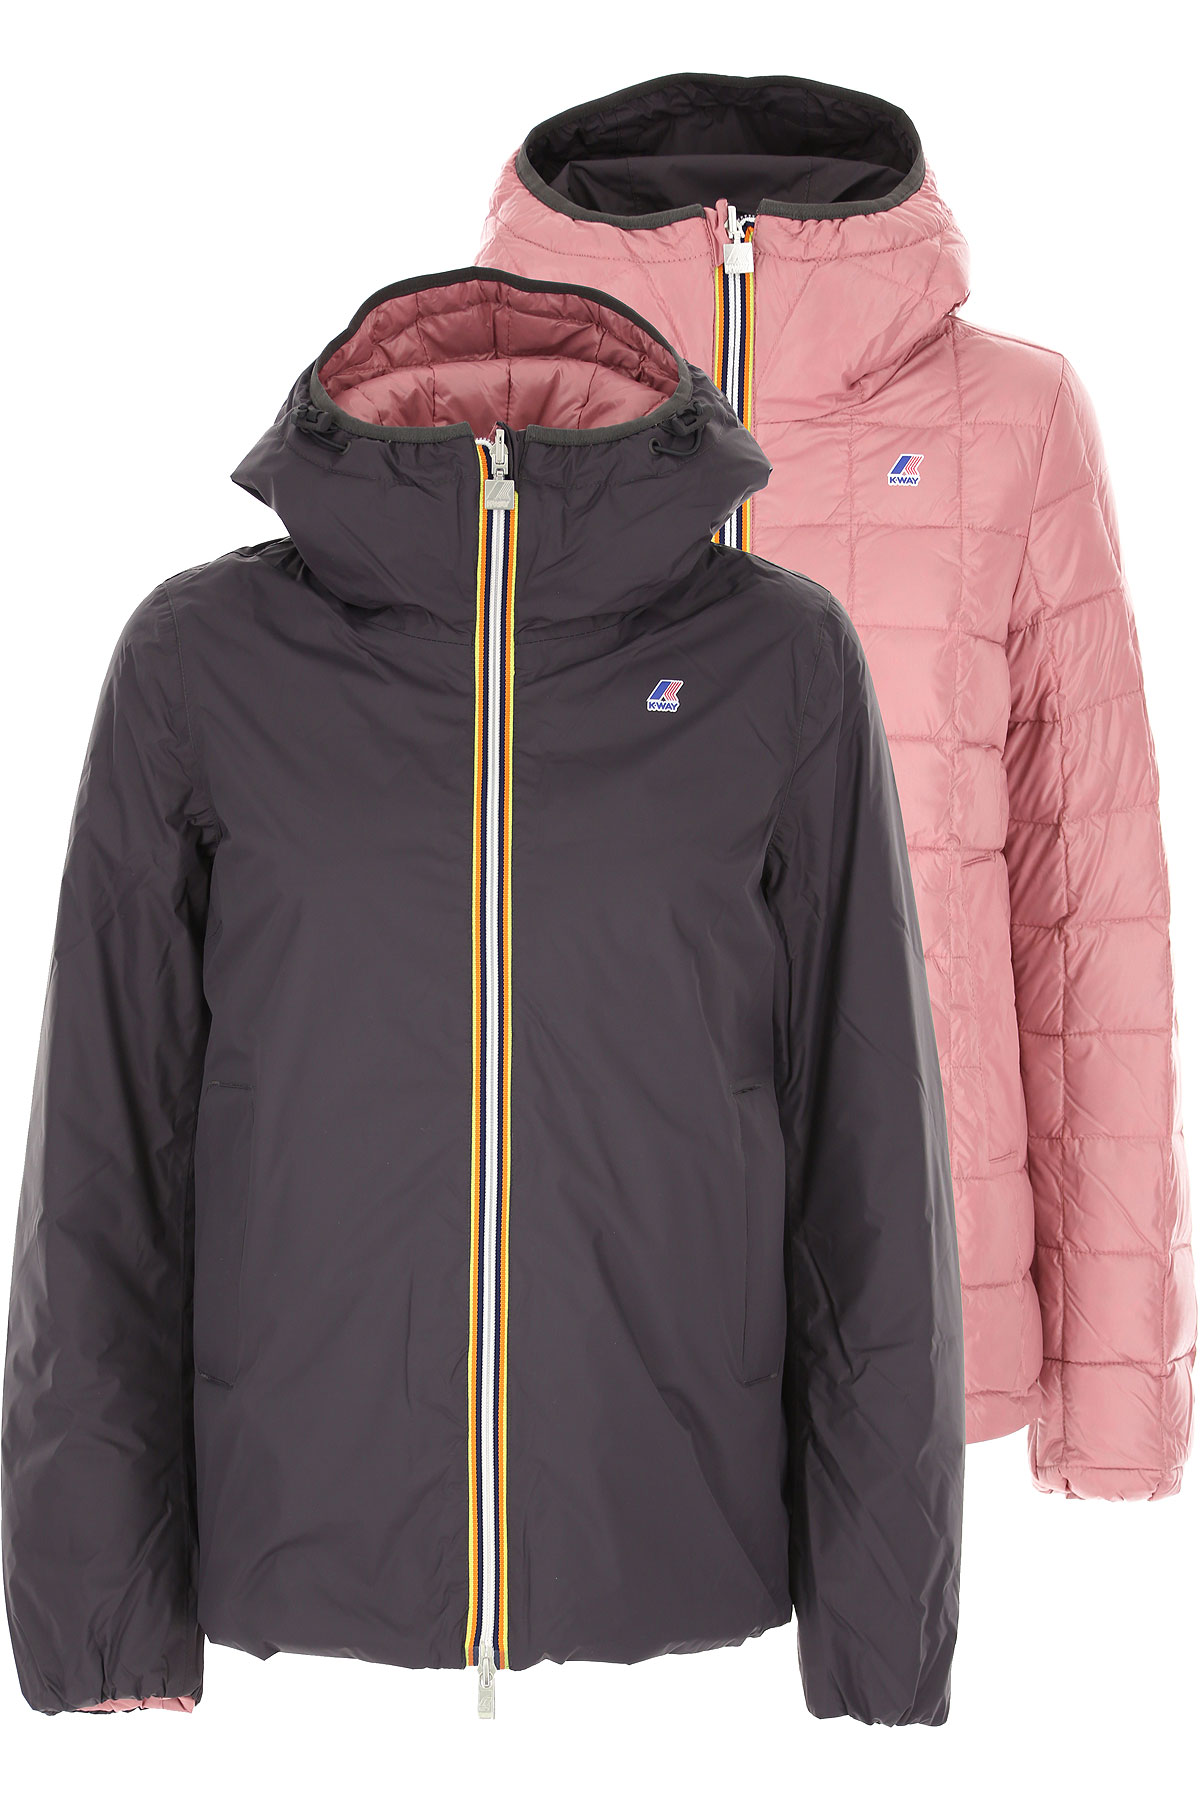 K-Way Down Jacket for Women, Puffer Ski Jacket On Sale, Navy Blue, polyamide, 2019, 40 44